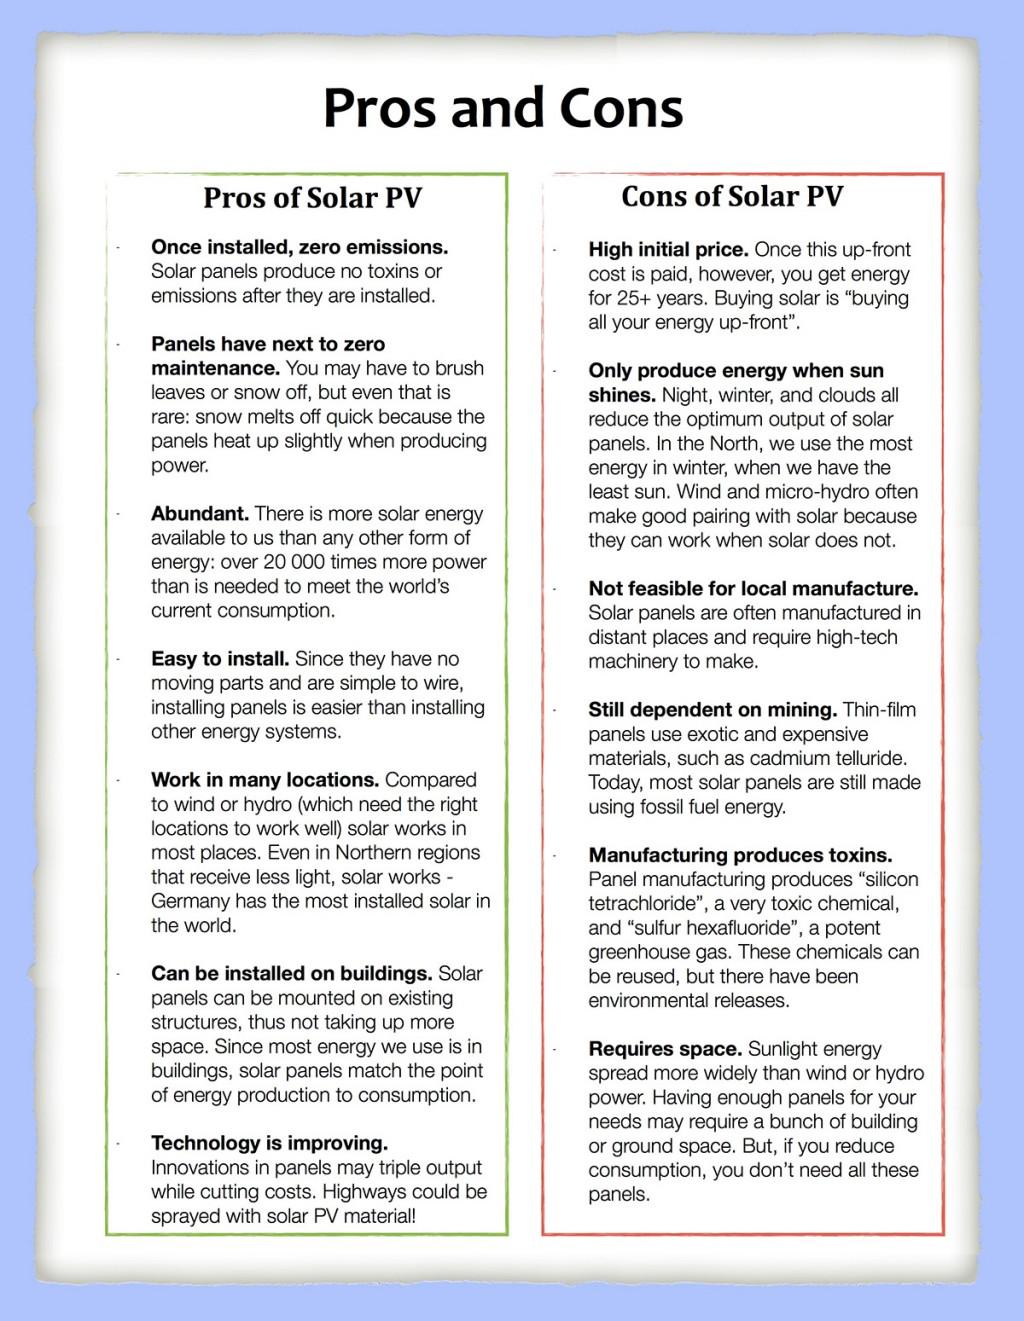 006 Solarposter6 Should Students Wear School Uniforms Essay Impressive Ielts Uniform Sample Large